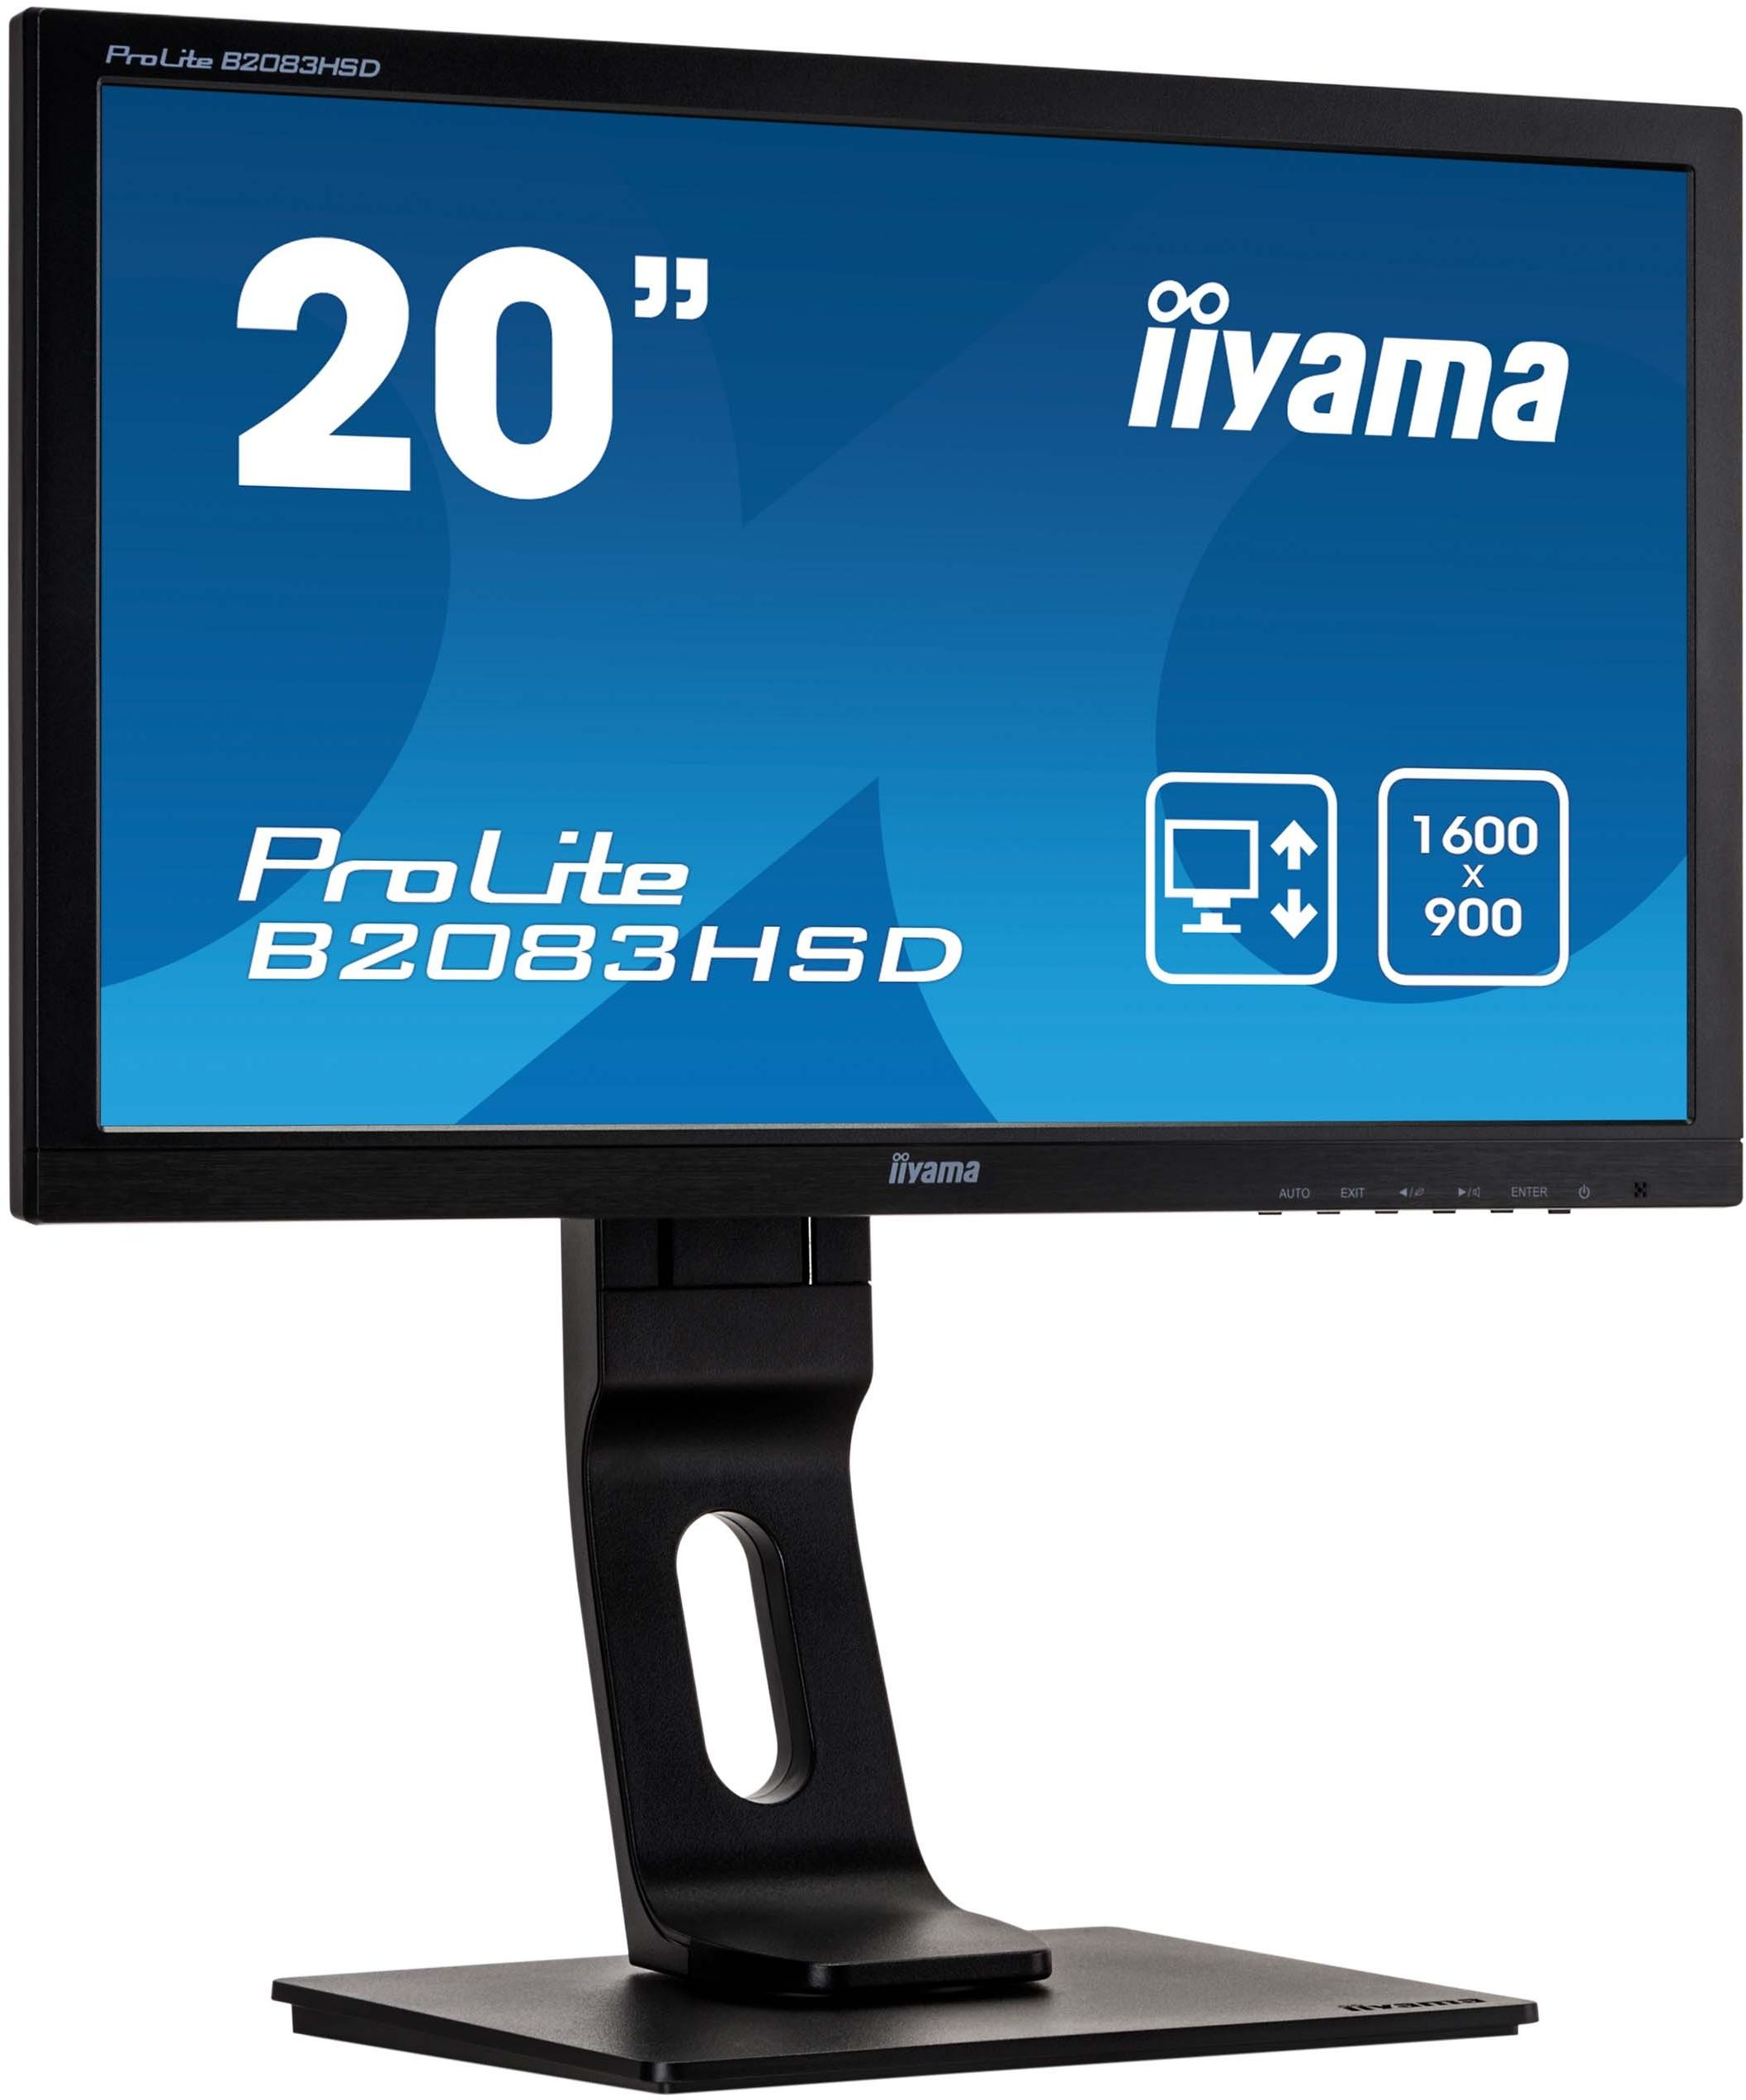 Monitor iiyama ProLite B2083HSD-B1 20'' FLICKER FREE HD LED + WYSYŁKA W 24H GRATIS !! AUTORYZOWANY SKLEP IIYAMA